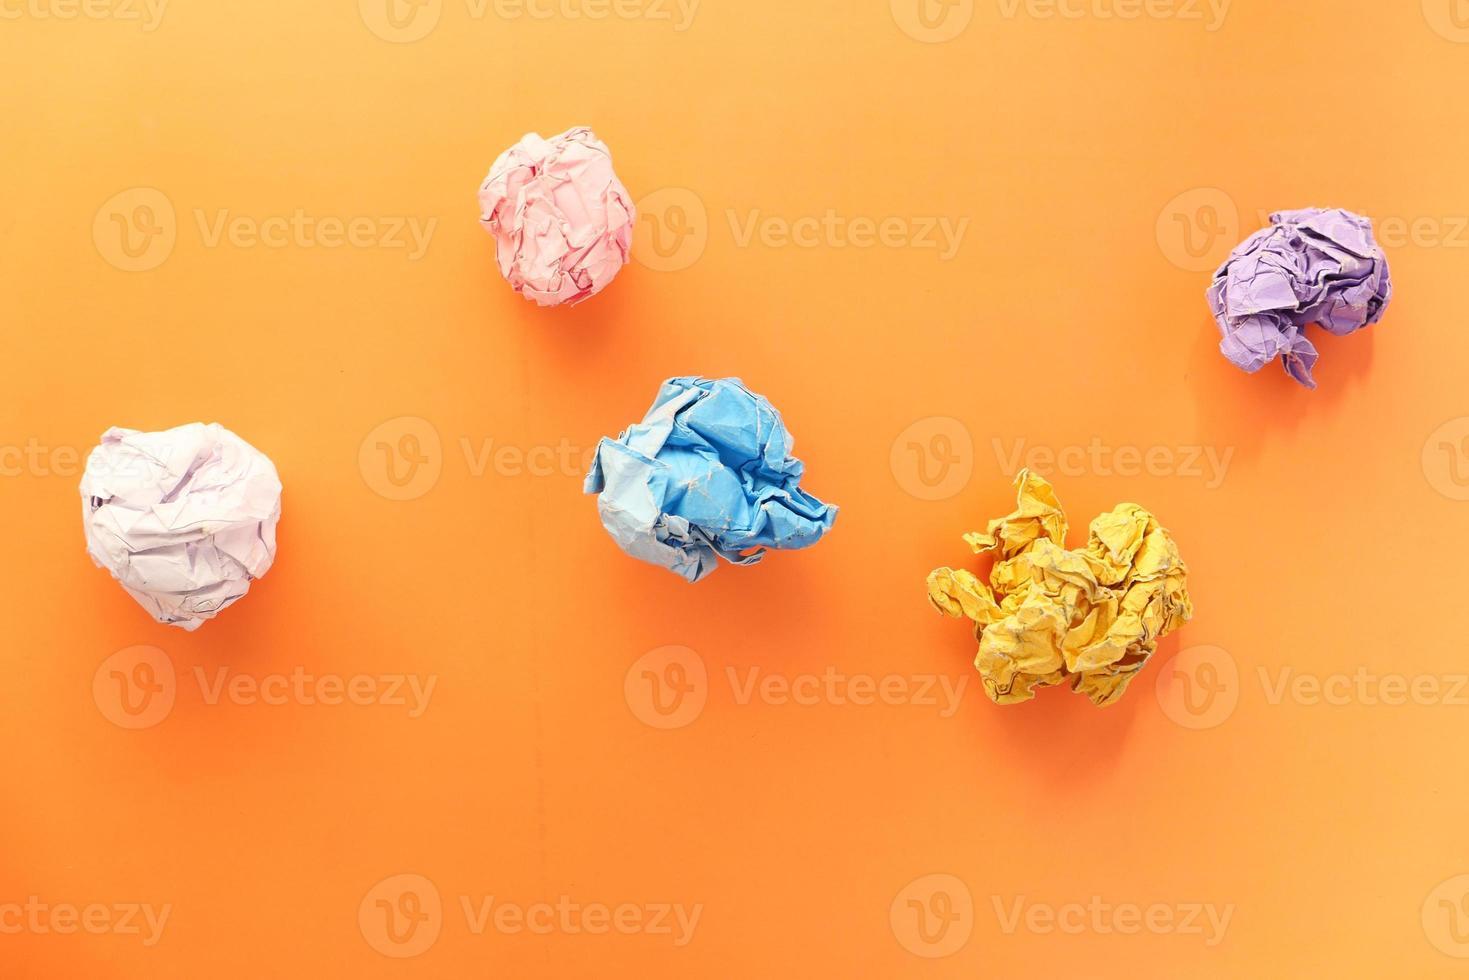 papel colorido amassado em fundo laranja foto